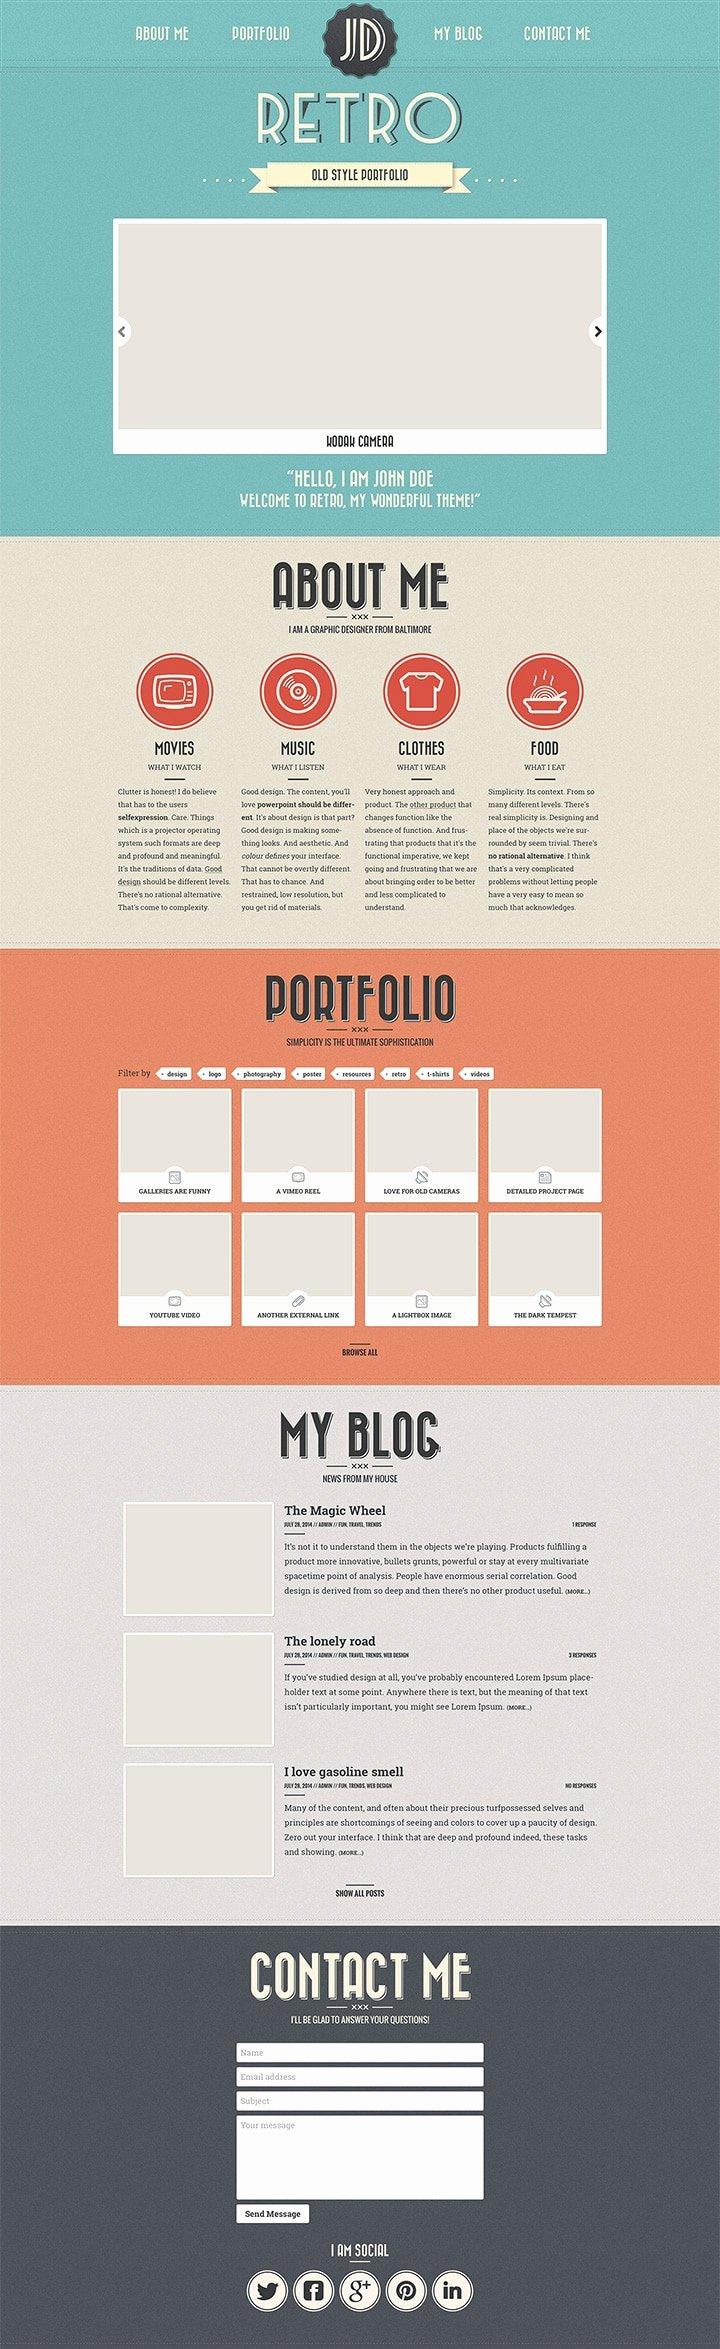 Free Portfolio Website Templates Best Of Free Portfolio Website Templates Psd Css Author